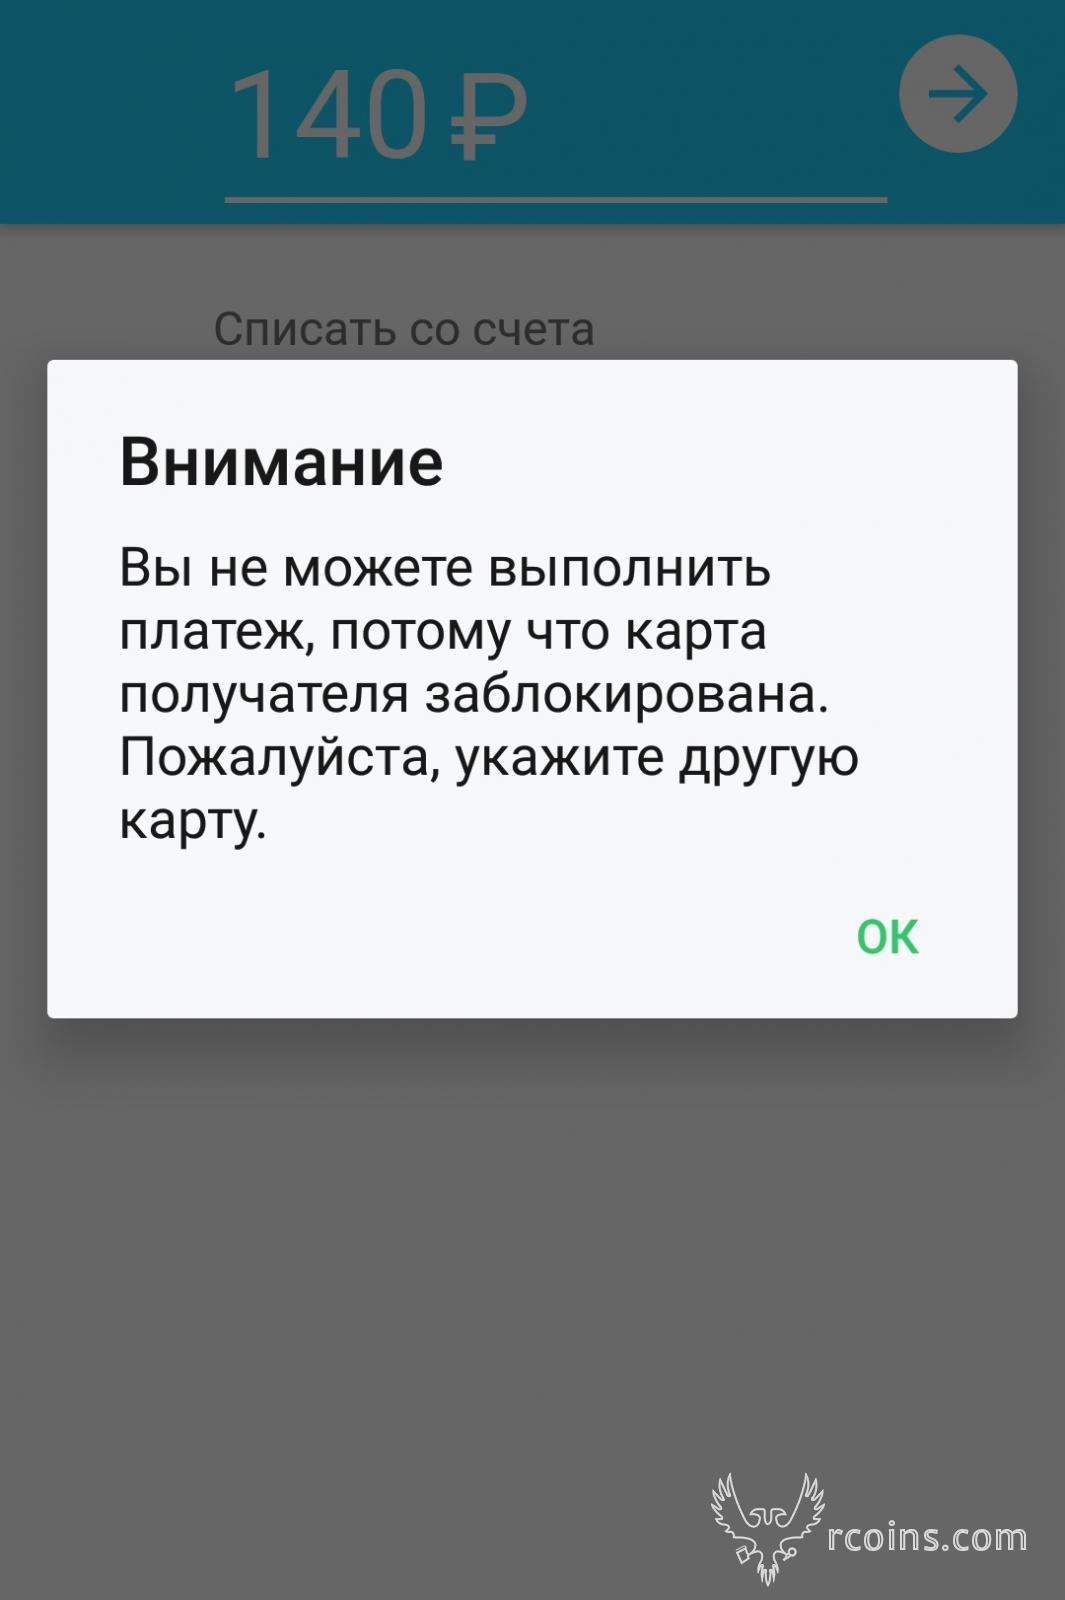 IMG_20190215_223021.jpg